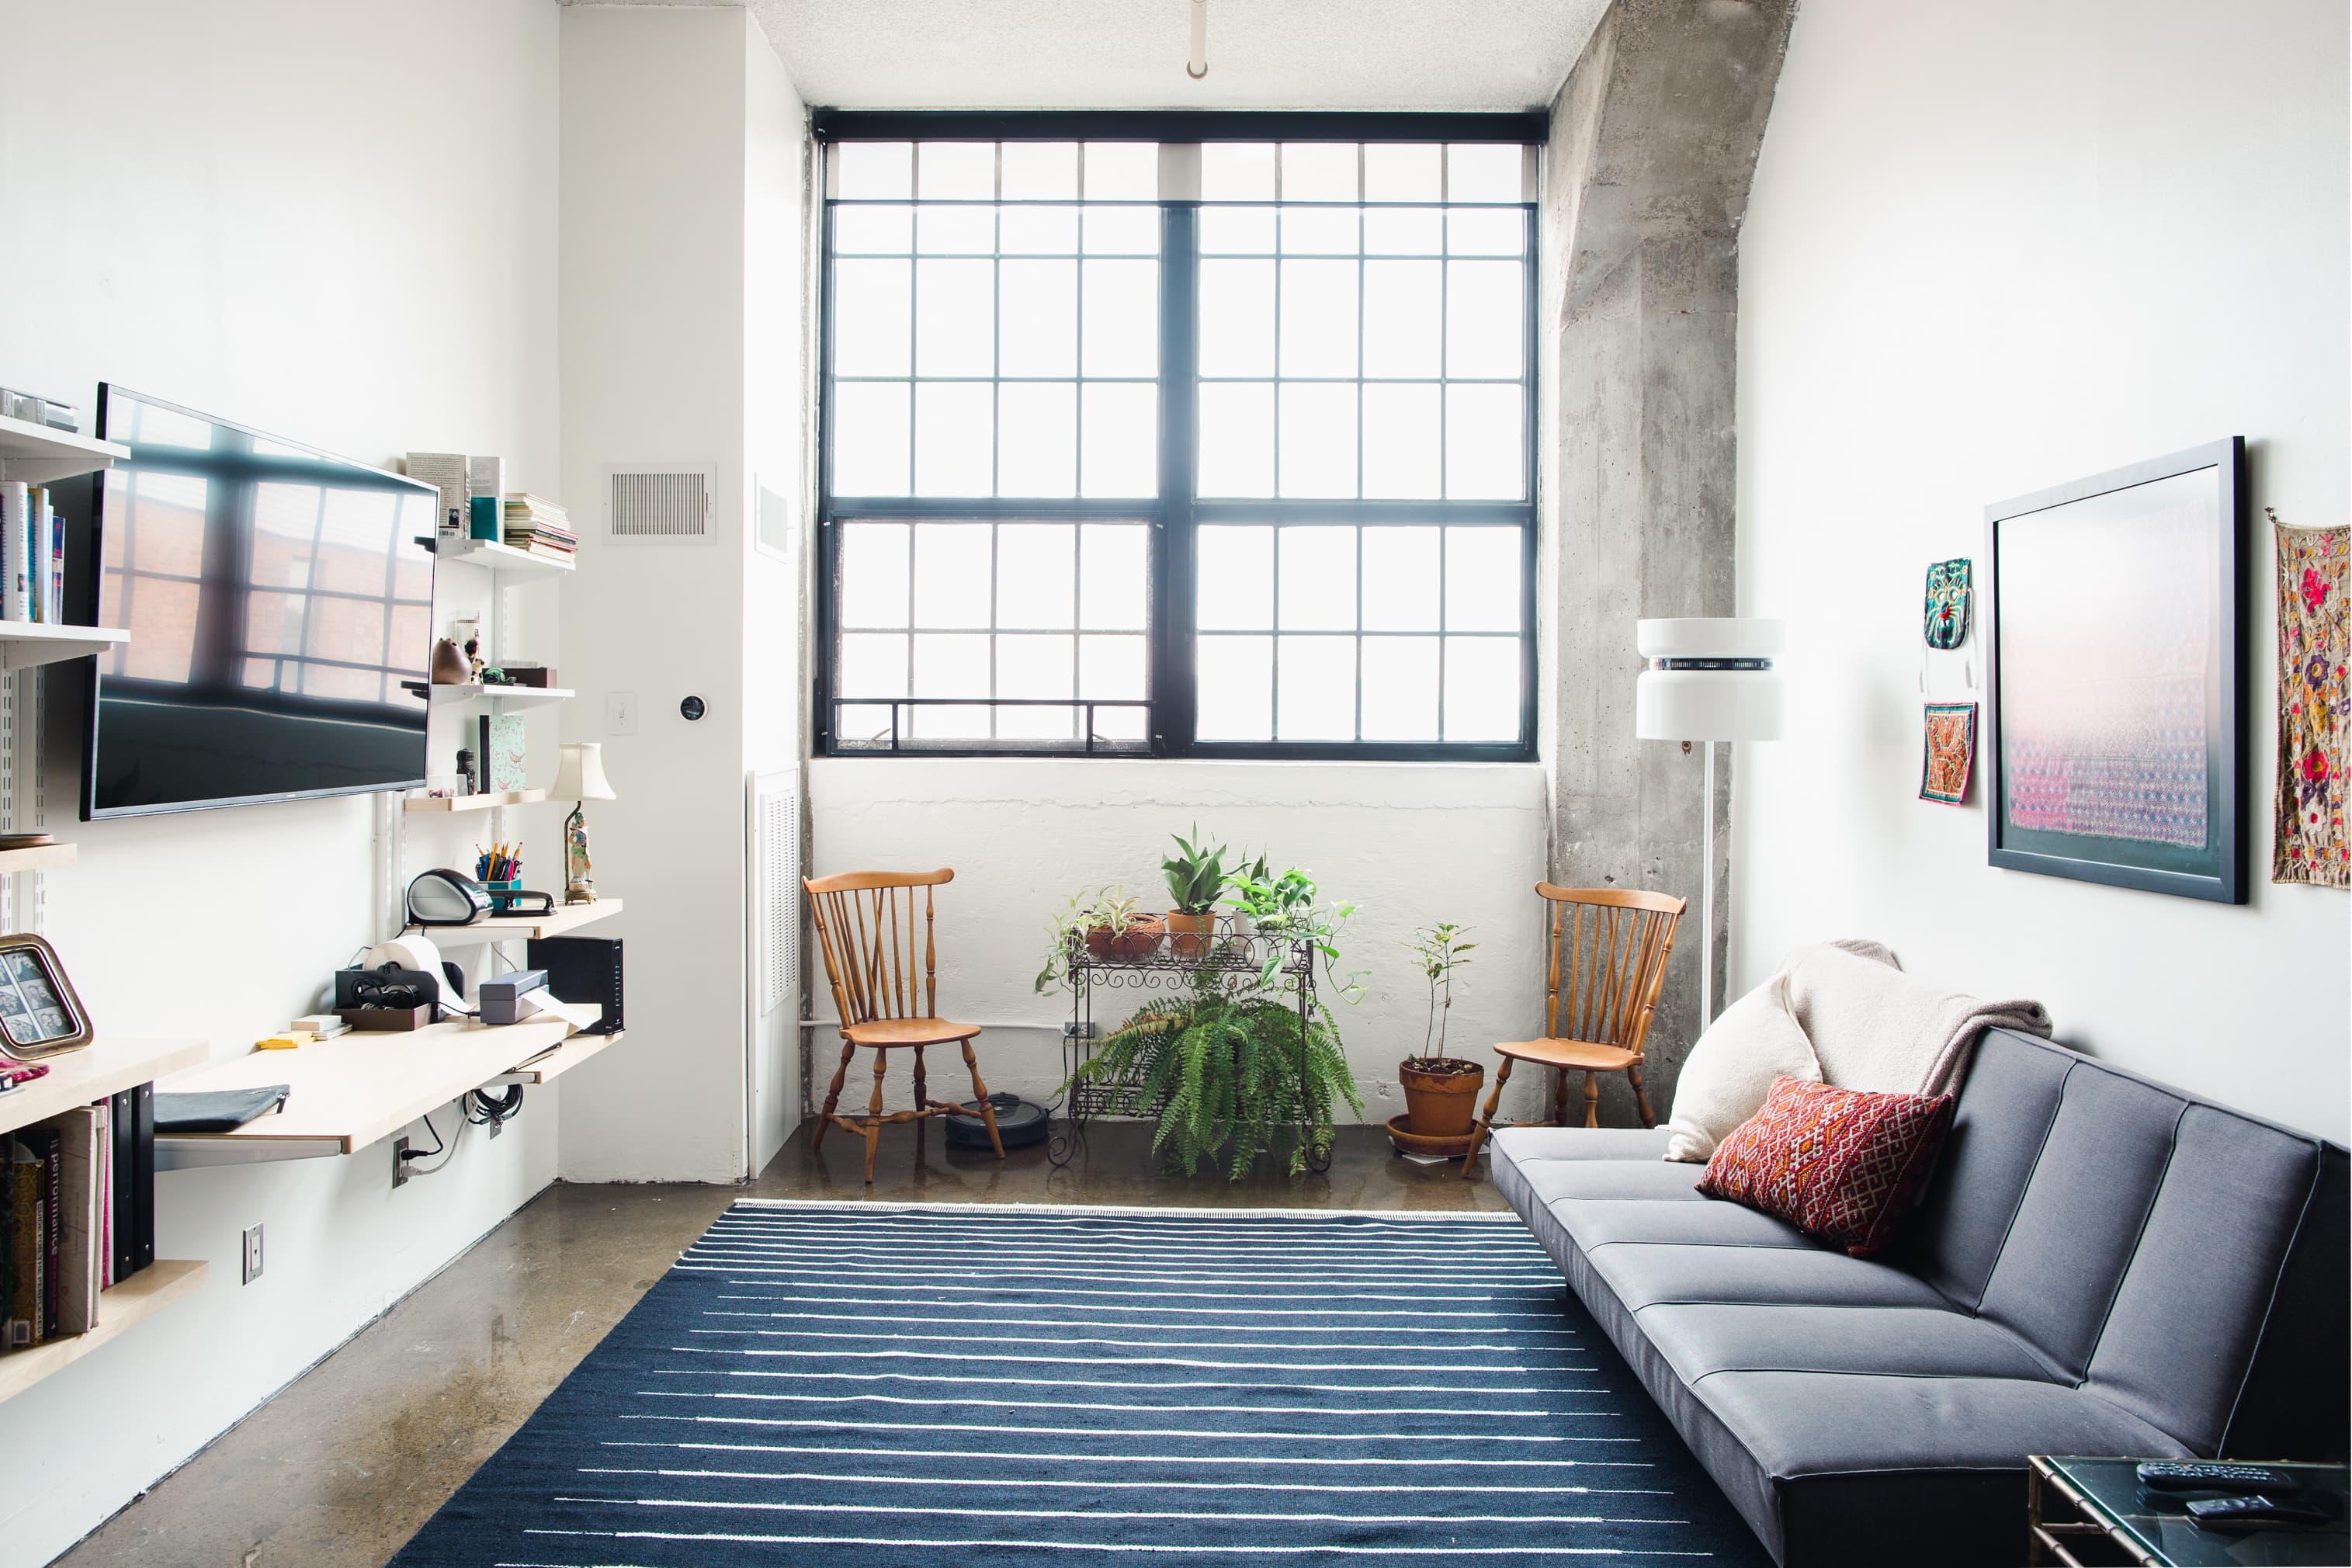 This Eclectic Minimal Detroit Loft Has A Modern Italian